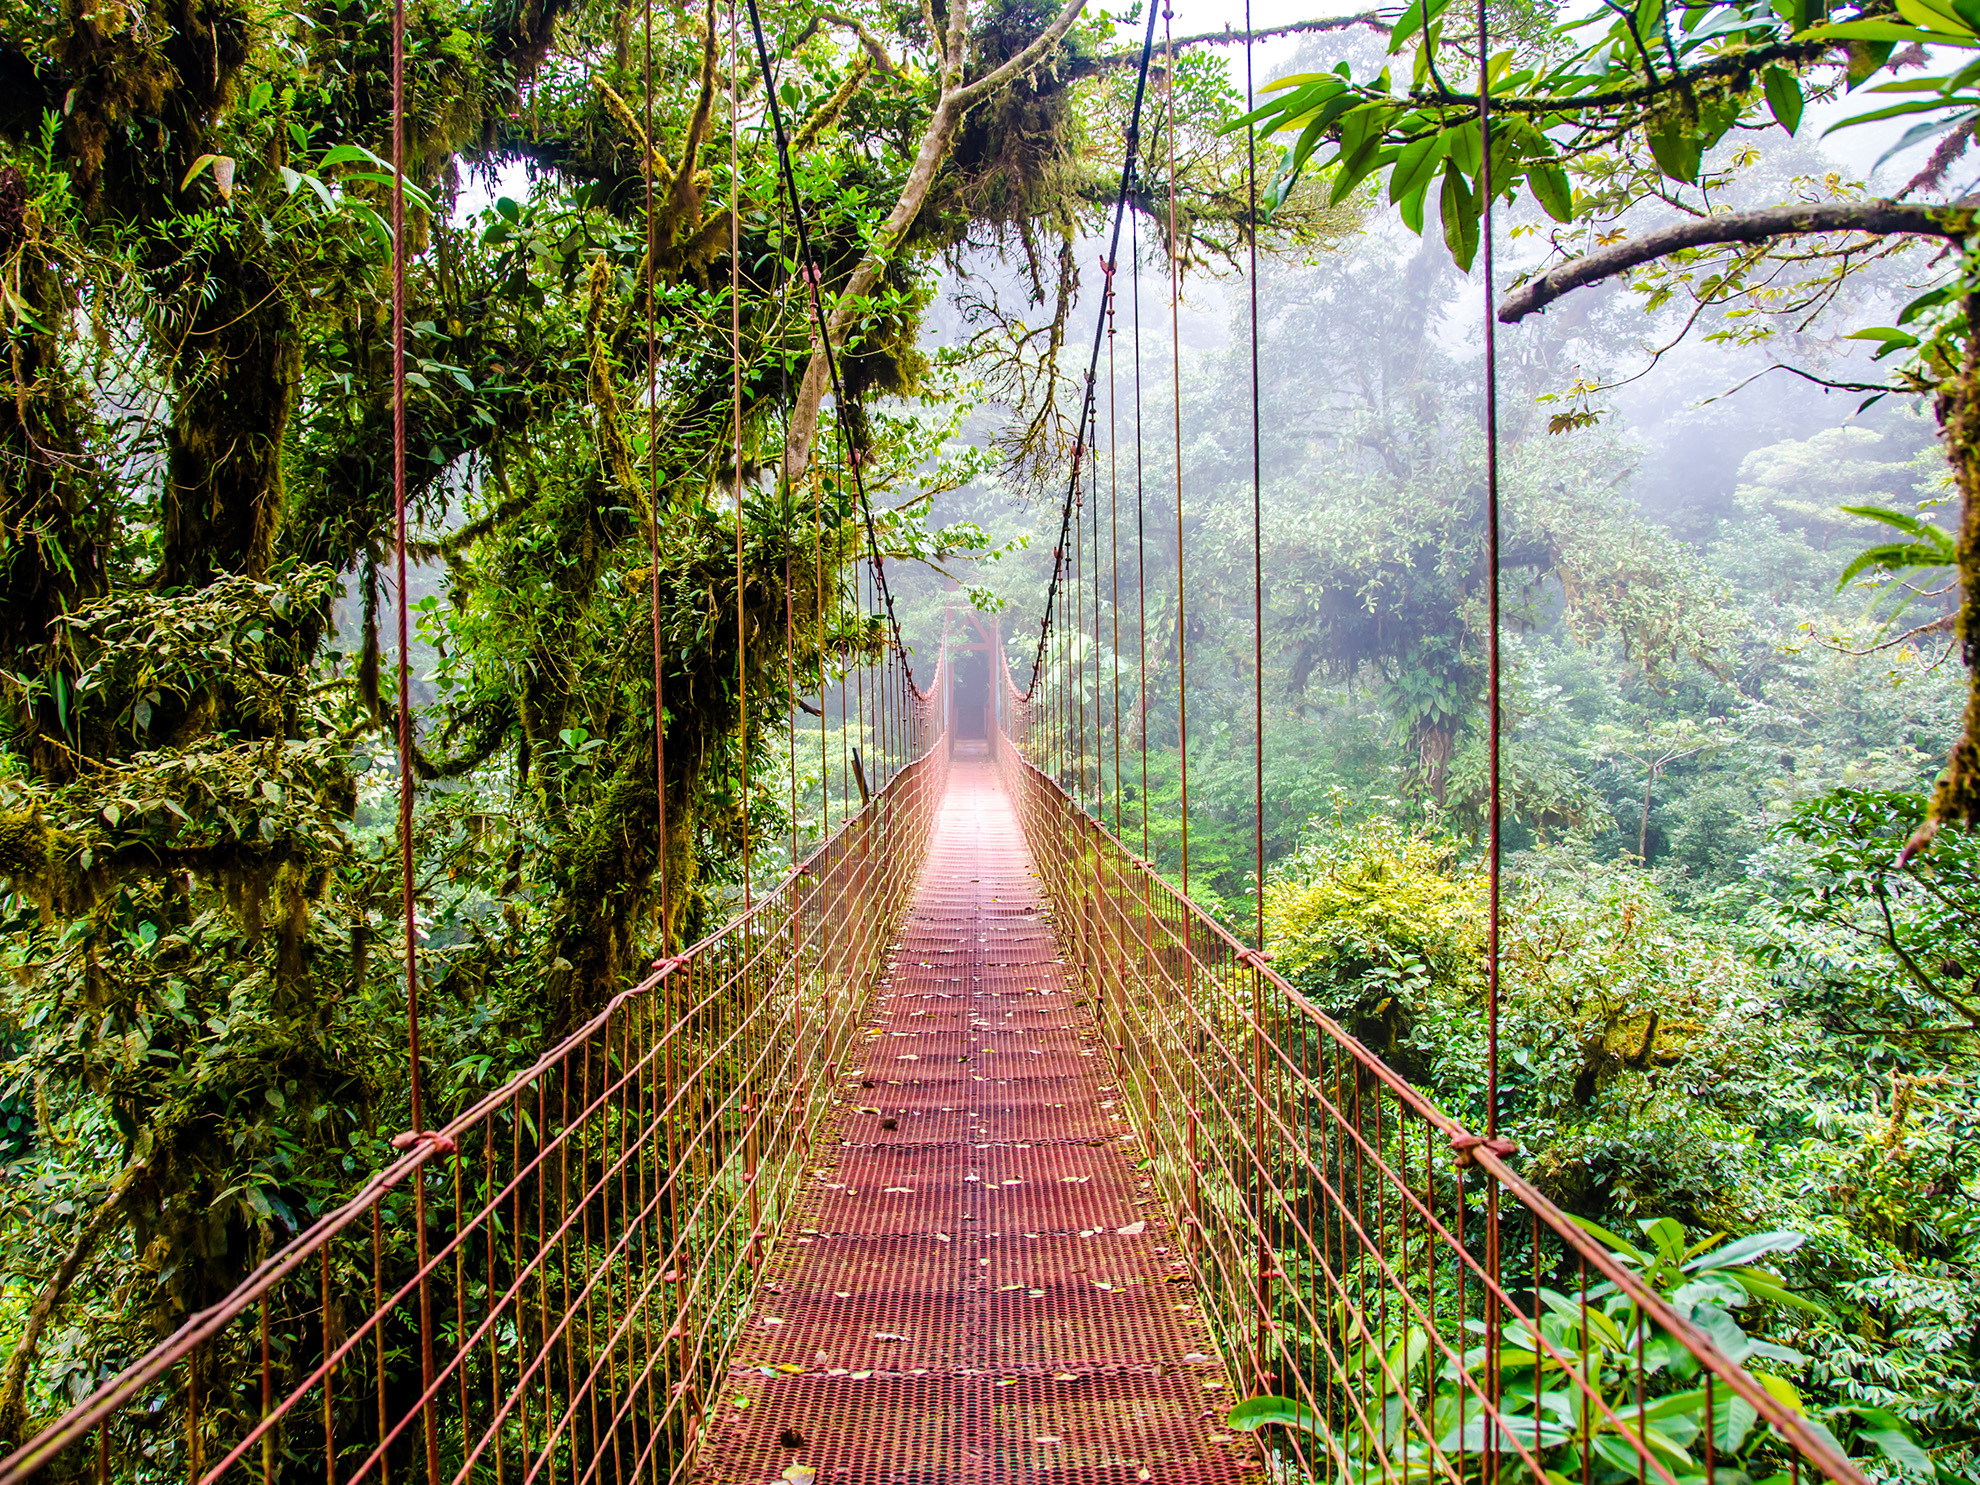 Monteverde Cloud Forest - Monte Verde, Costa Rica